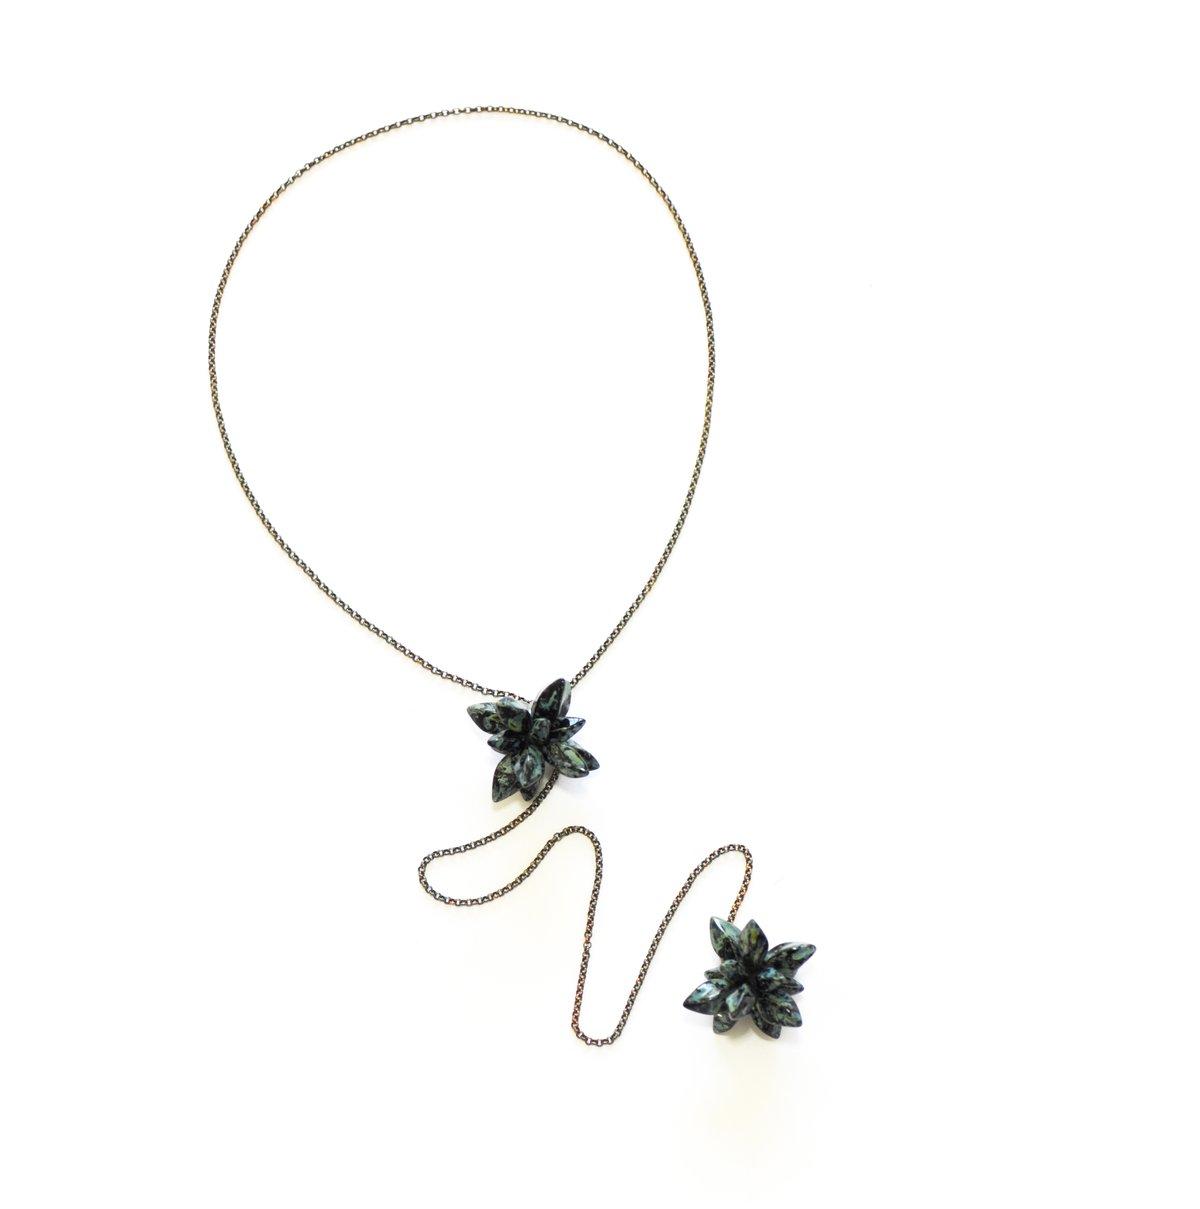 Image of STELLAR necklace